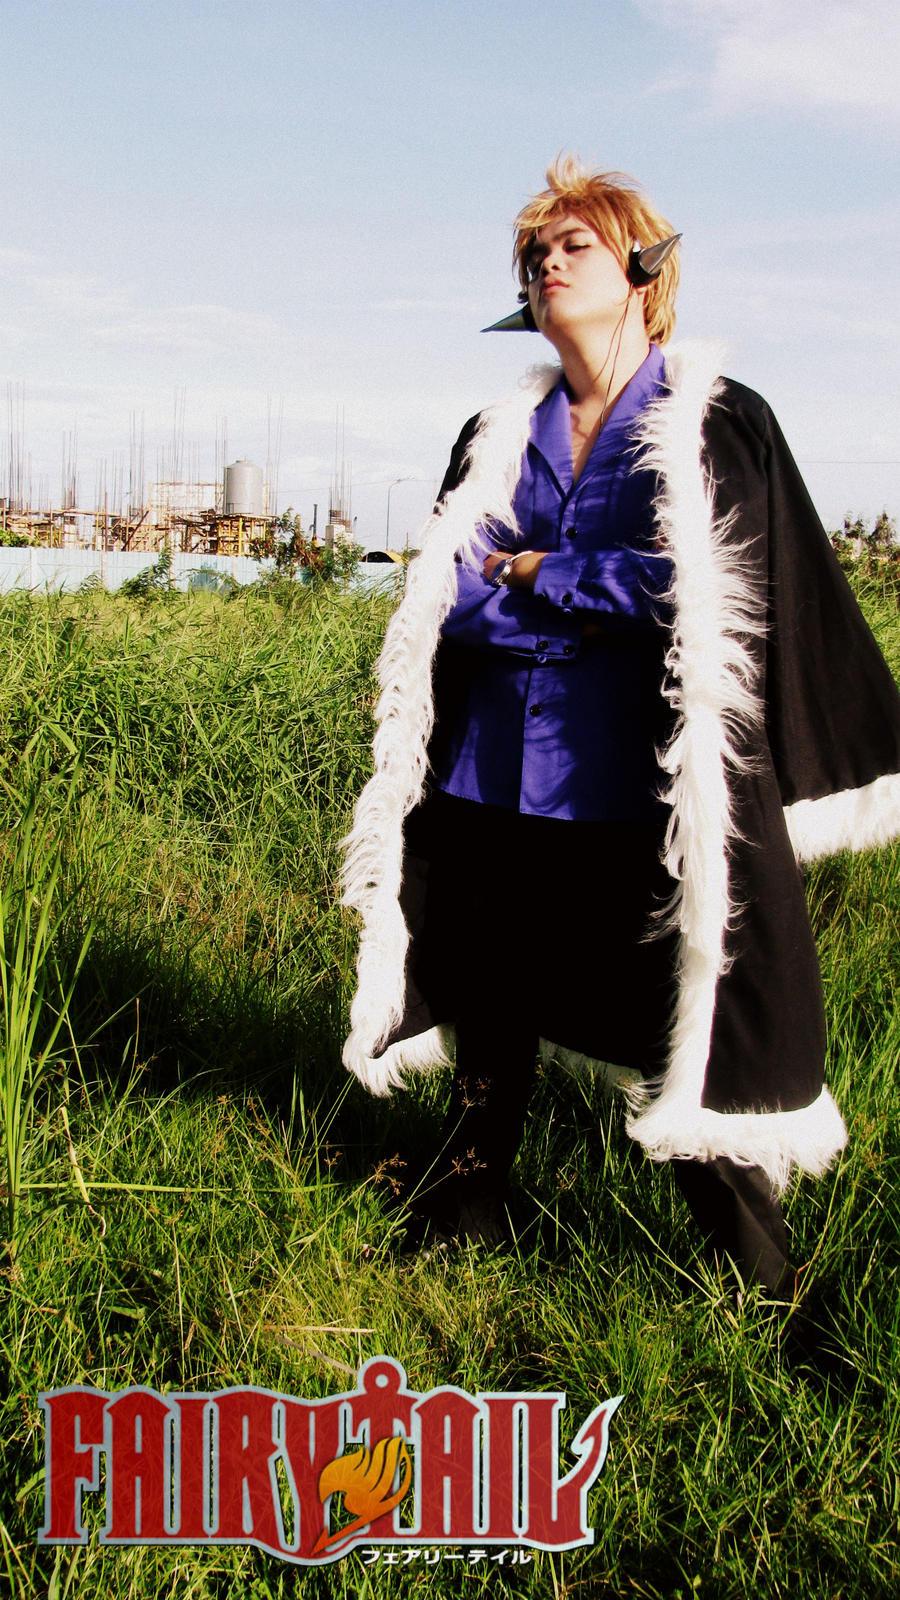 Fairy Tail Laxus Cosplay | www.imgkid.com - The Image Kid ...